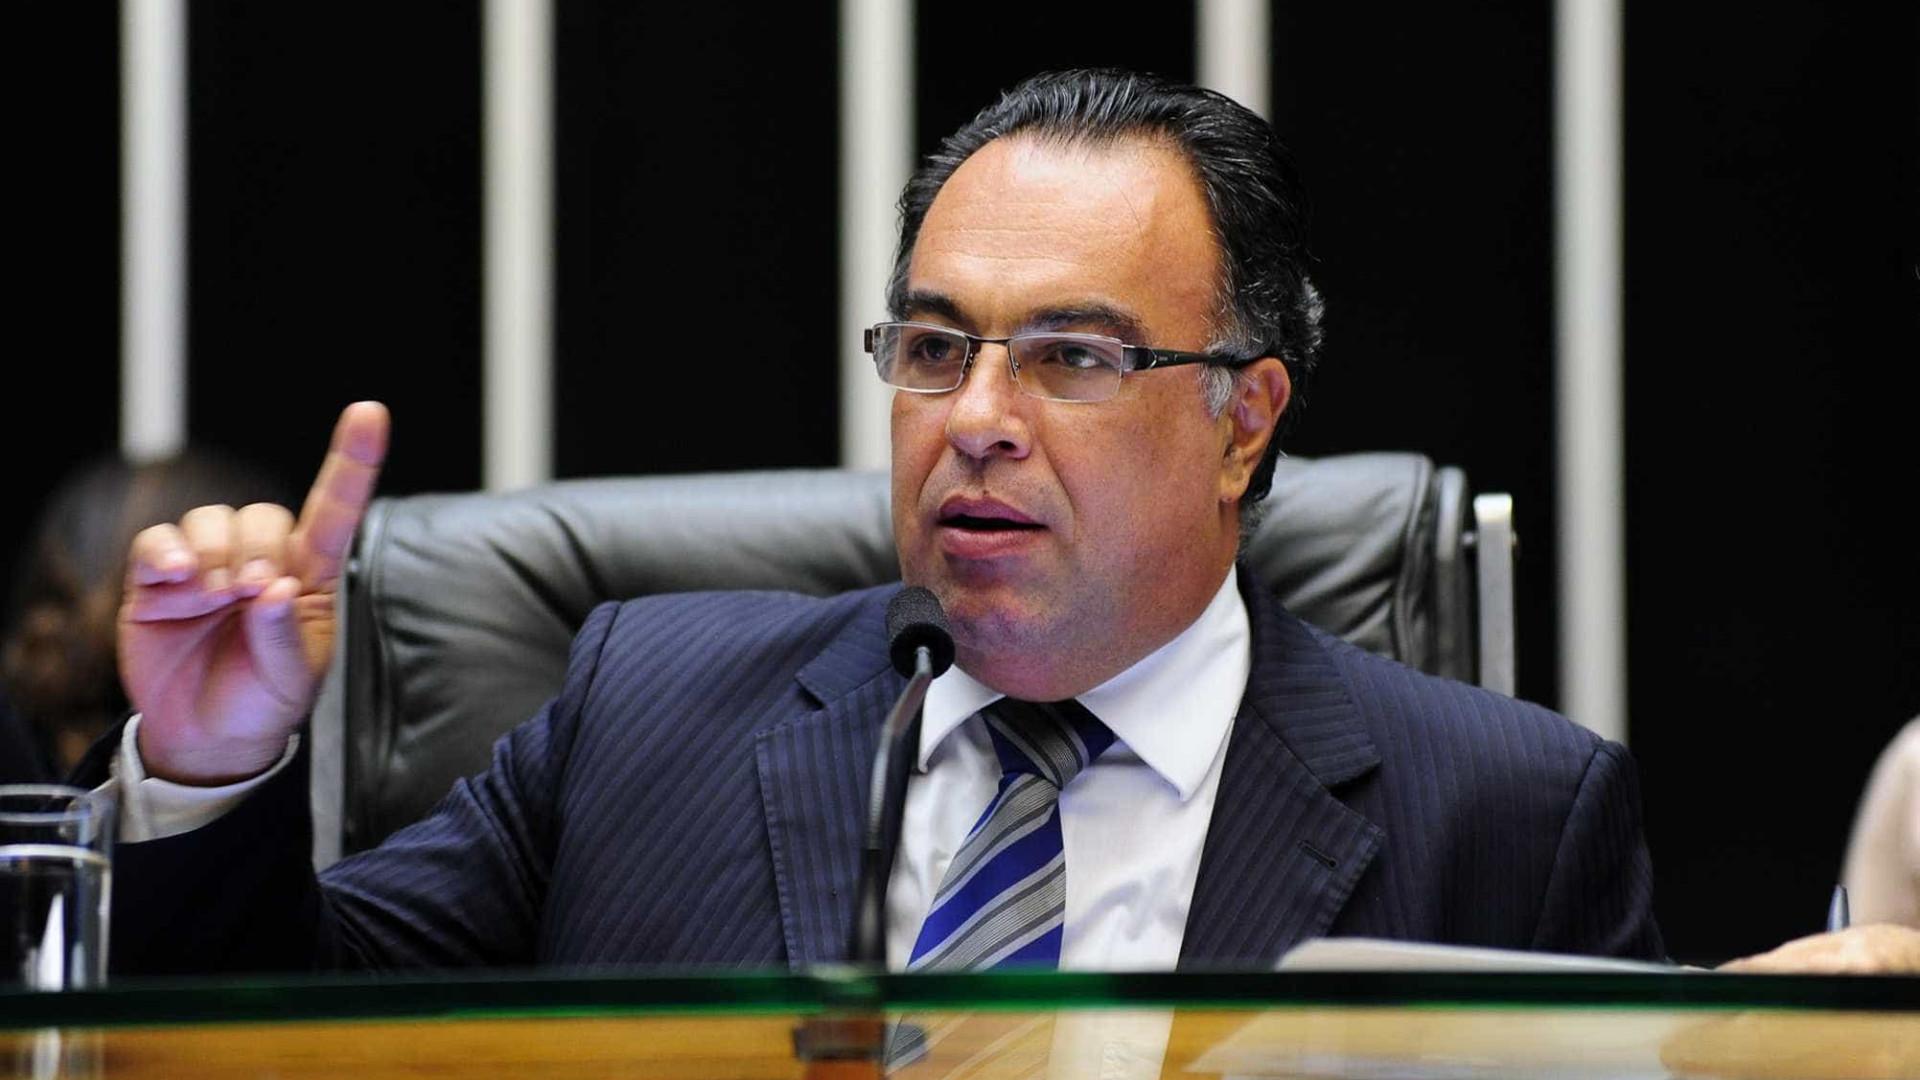 Preso na Lava Jato, ex-deputado André Vargas é solto